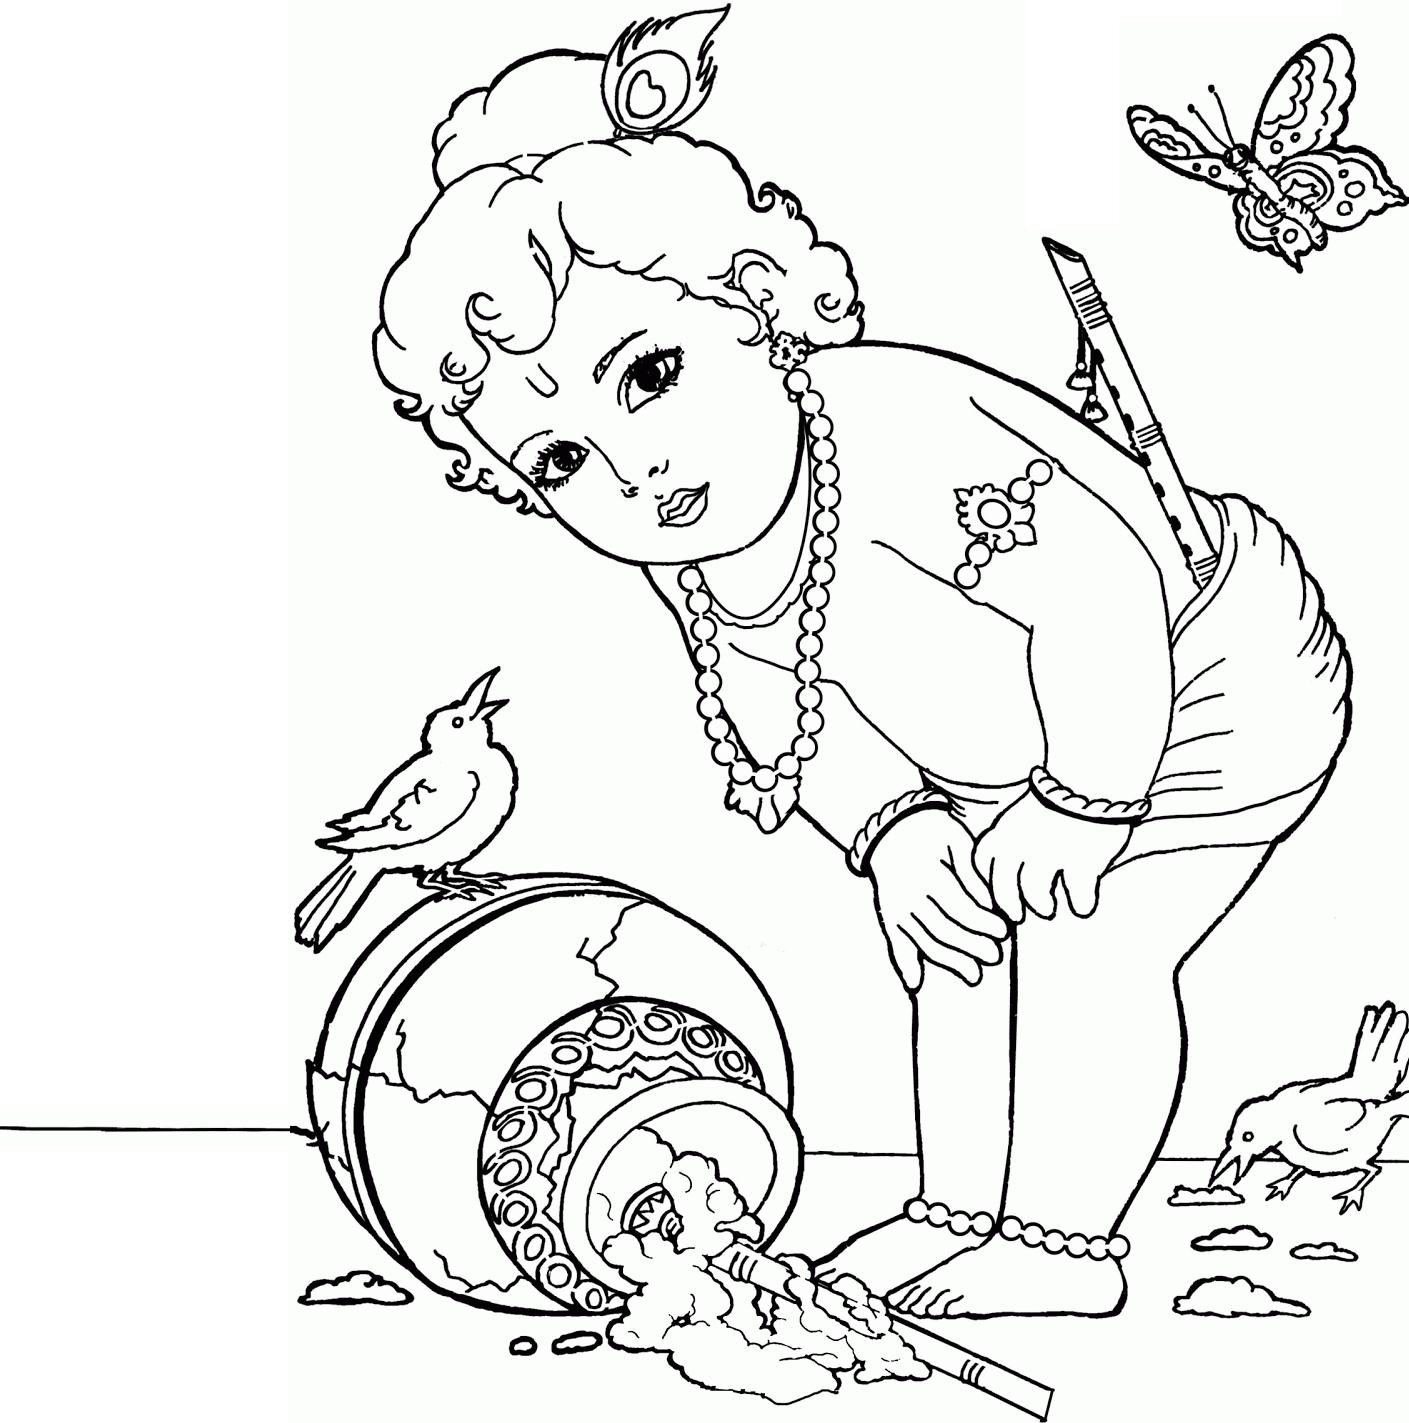 1409x1423 Gallery Little Krishna Cartoon Drawing,